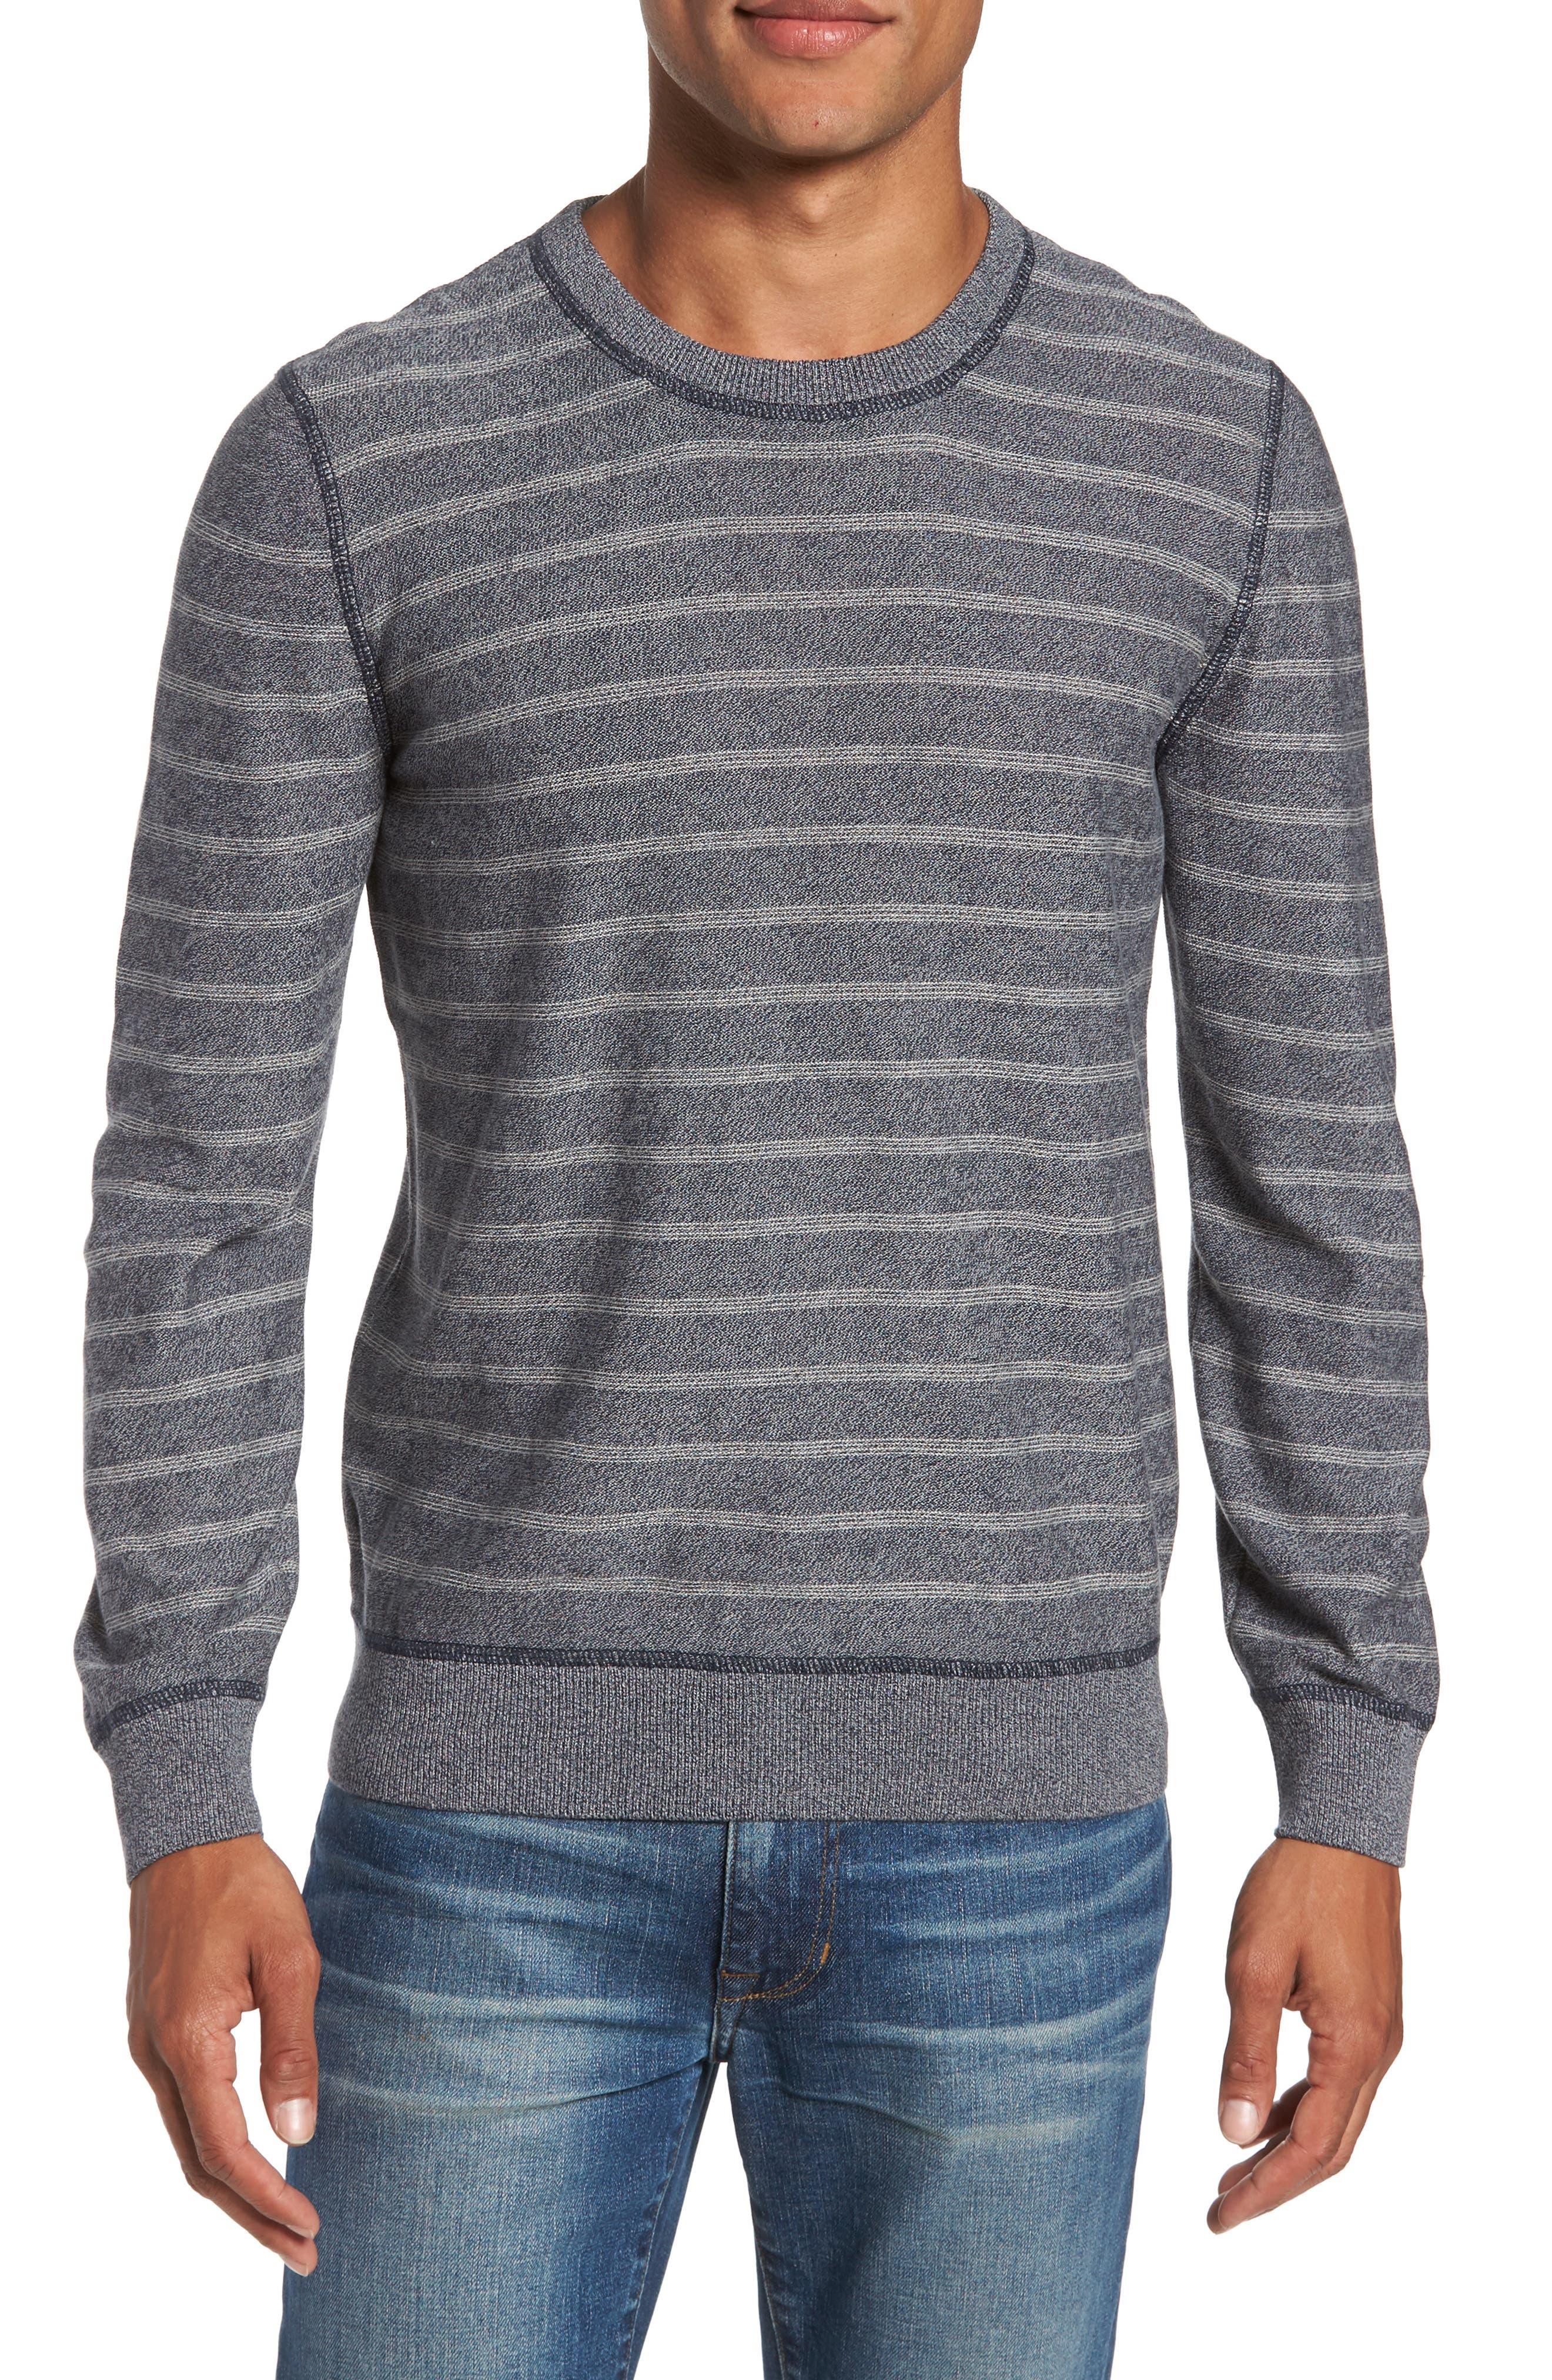 Tanner Crewneck Sweatshirt,                             Main thumbnail 1, color,                             021